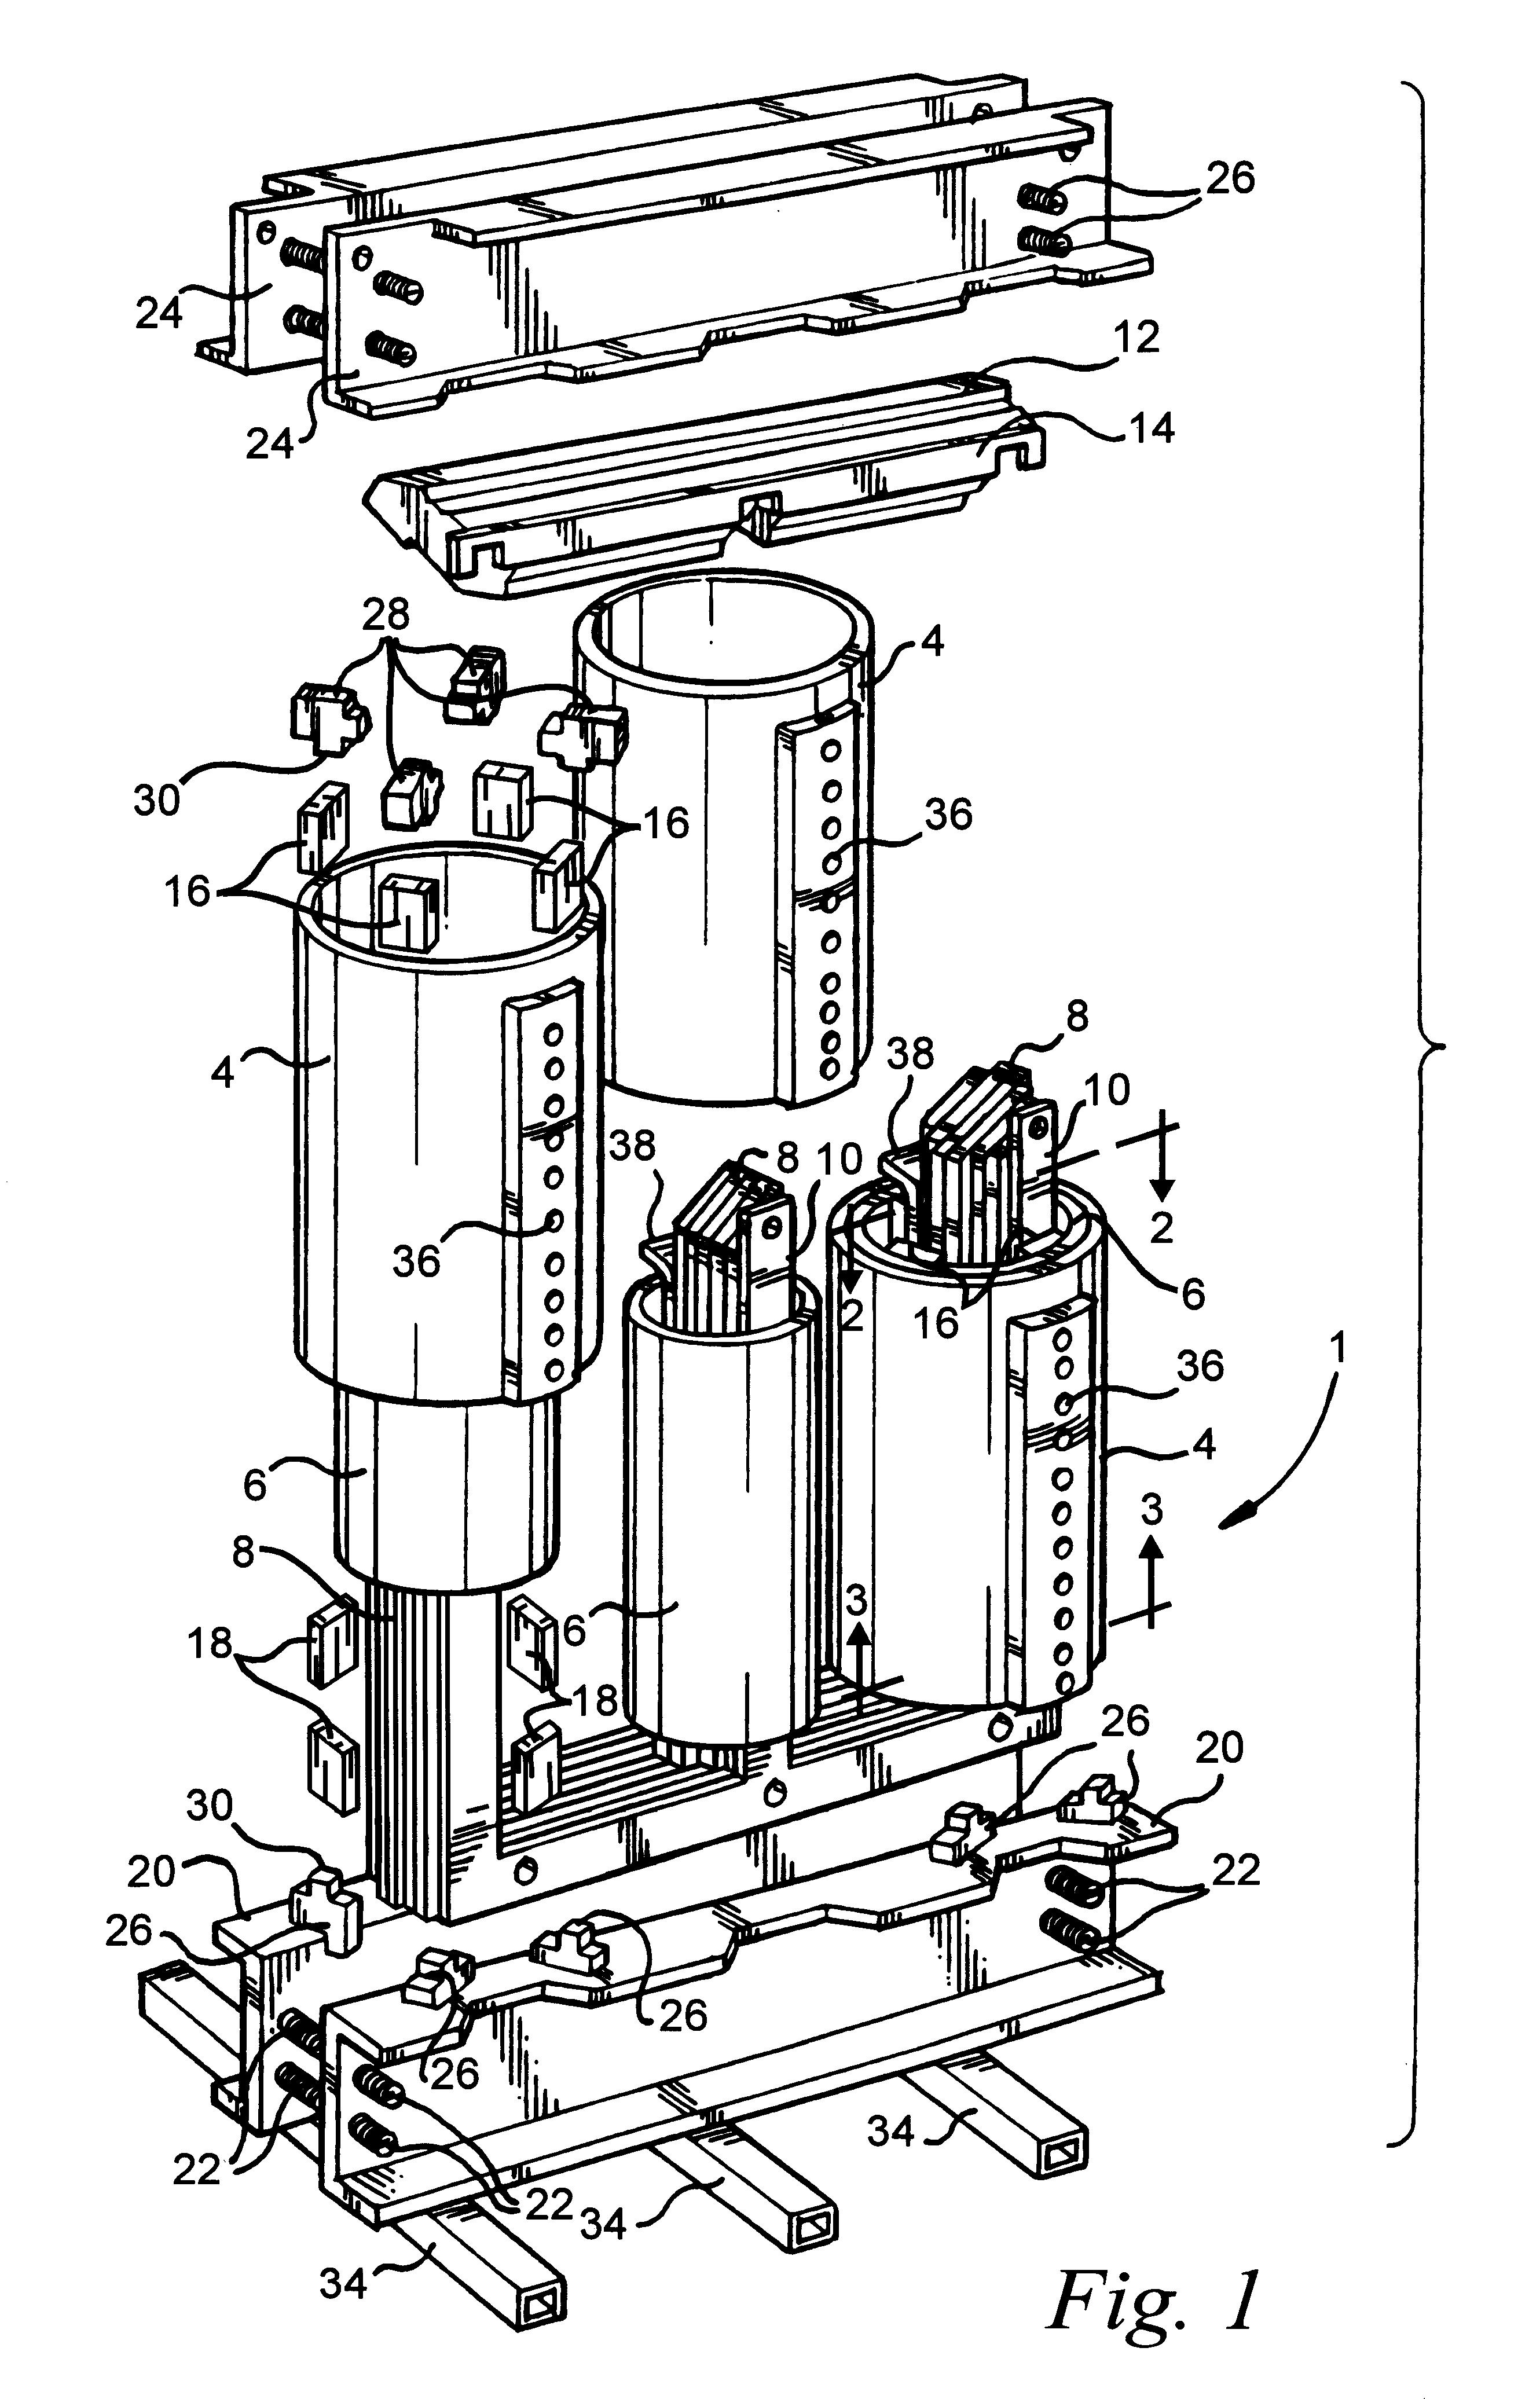 Luxury 5 7 Mercruiser Engine Wiring Diagram Photos - Wiring Diagram ...